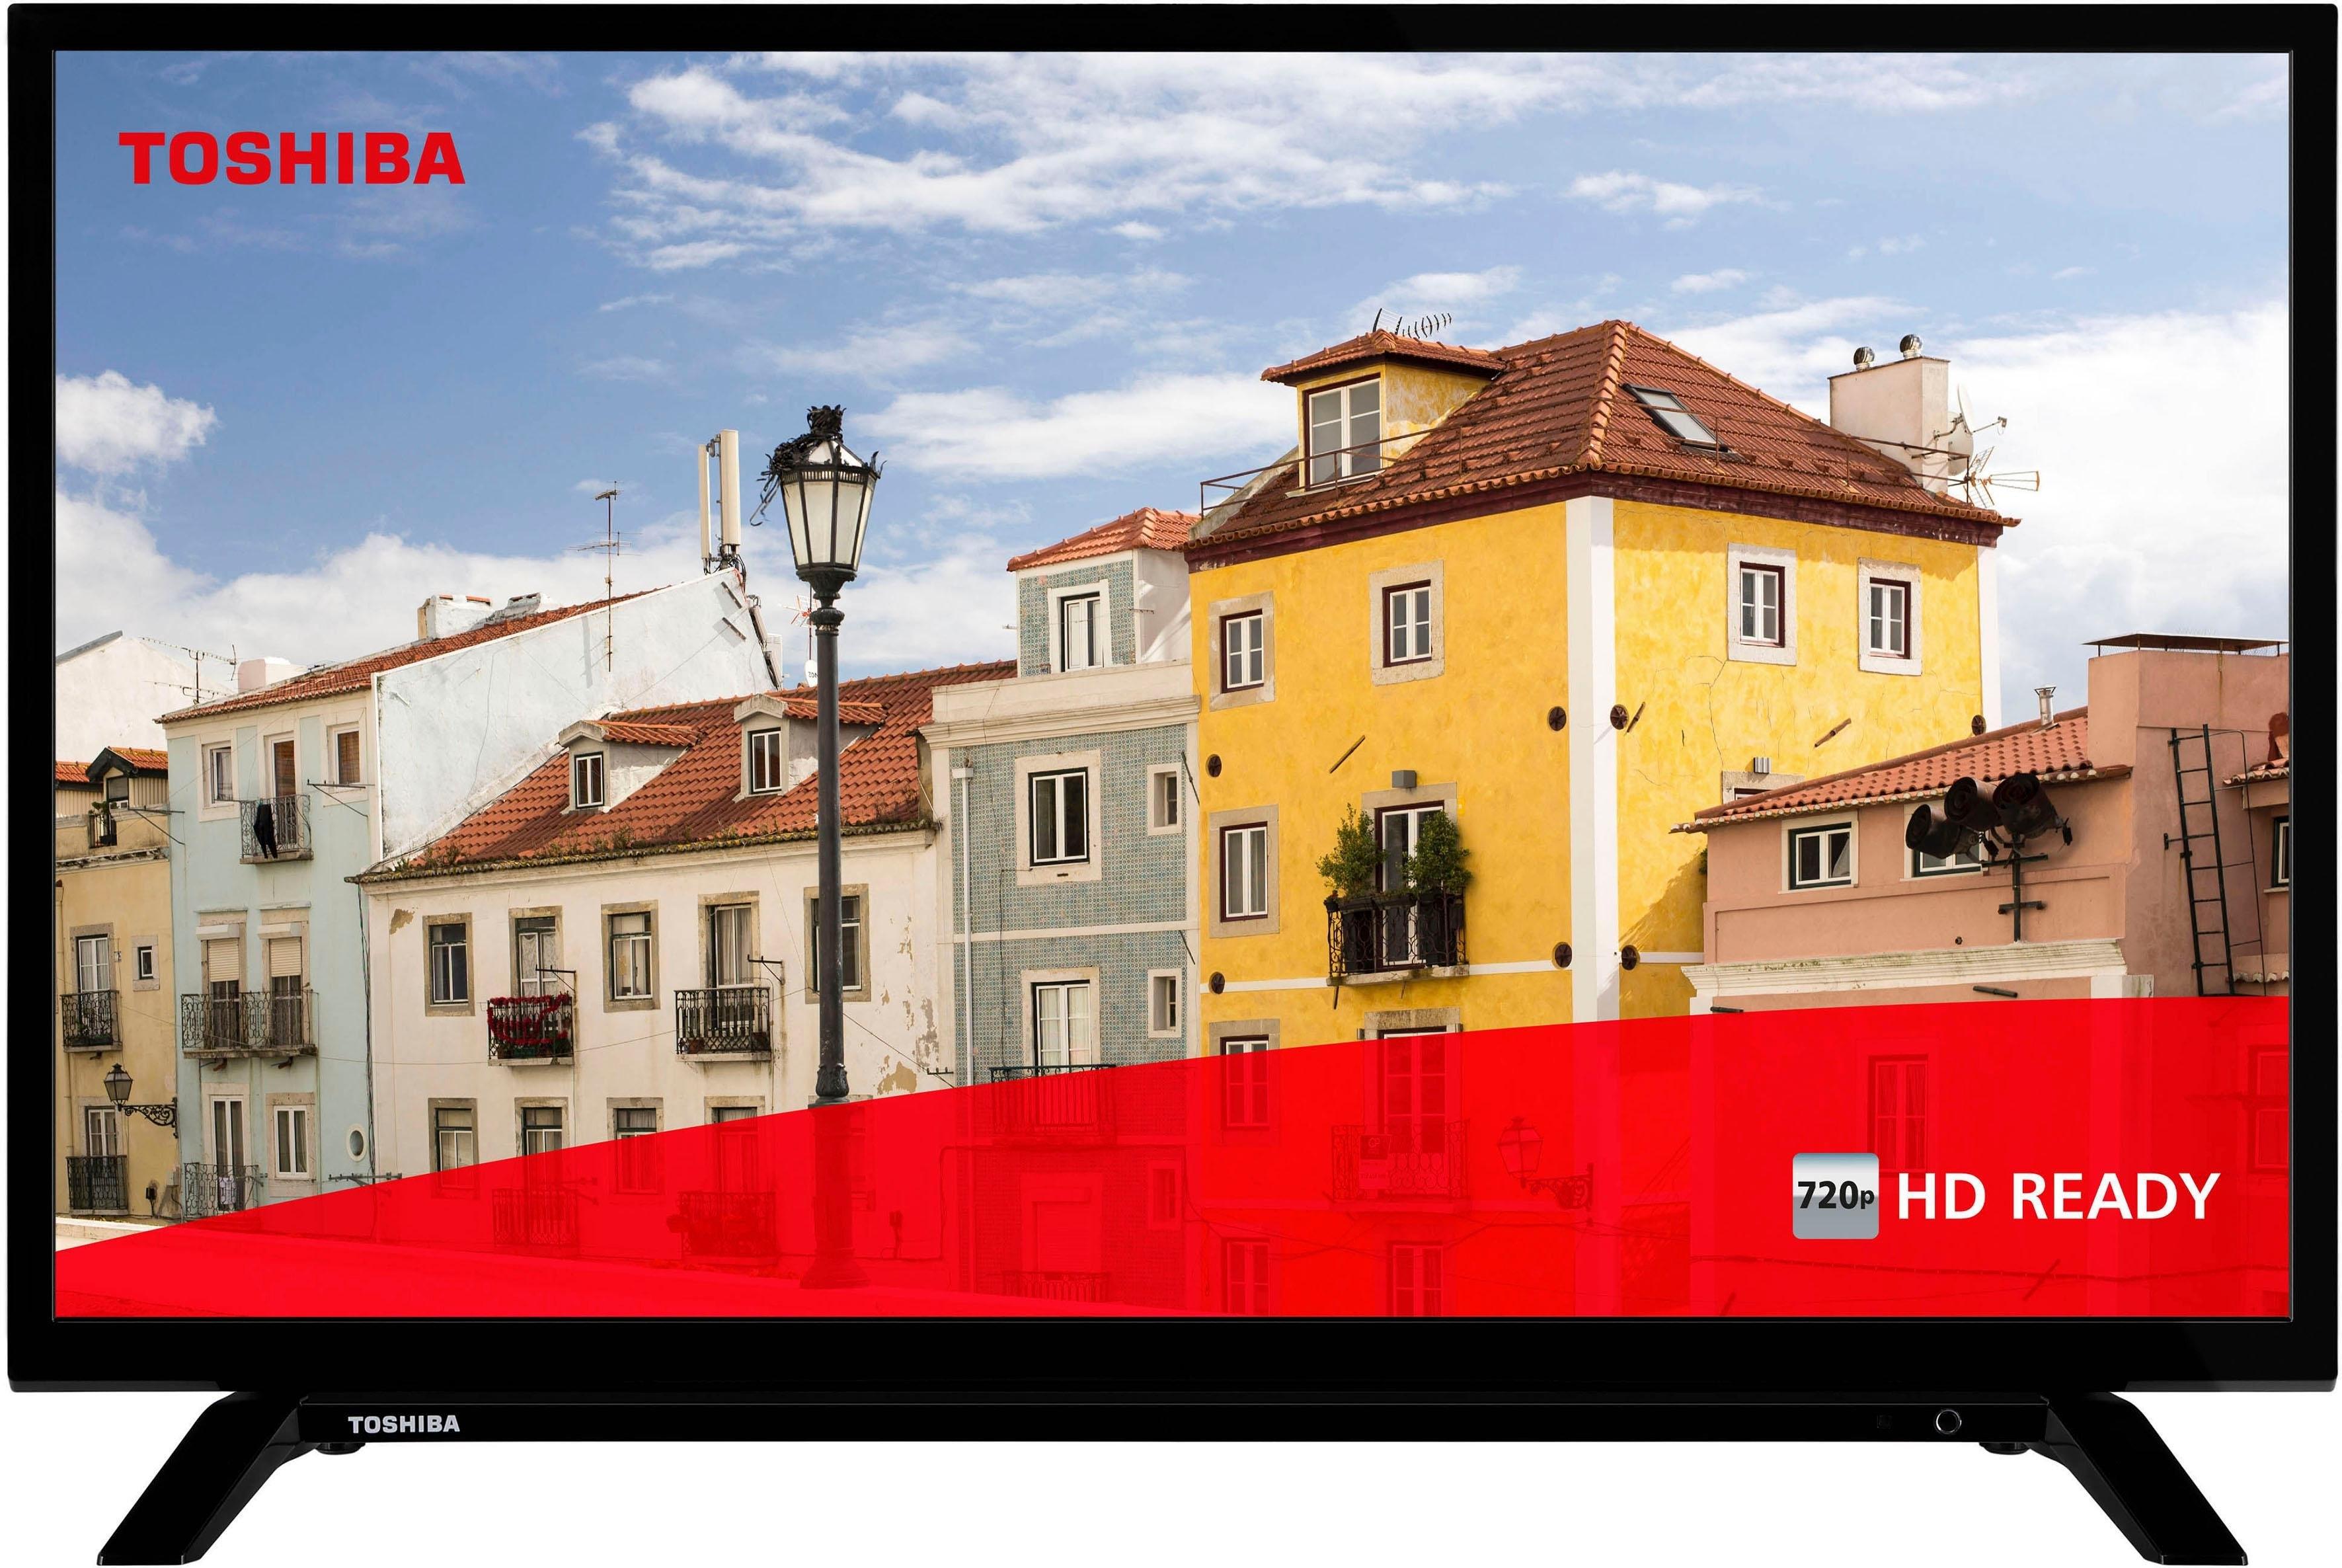 Toshiba 32W2963DG led-tv (80 cm / 32 inch), HD-ready, smart-tv voordelig en veilig online kopen